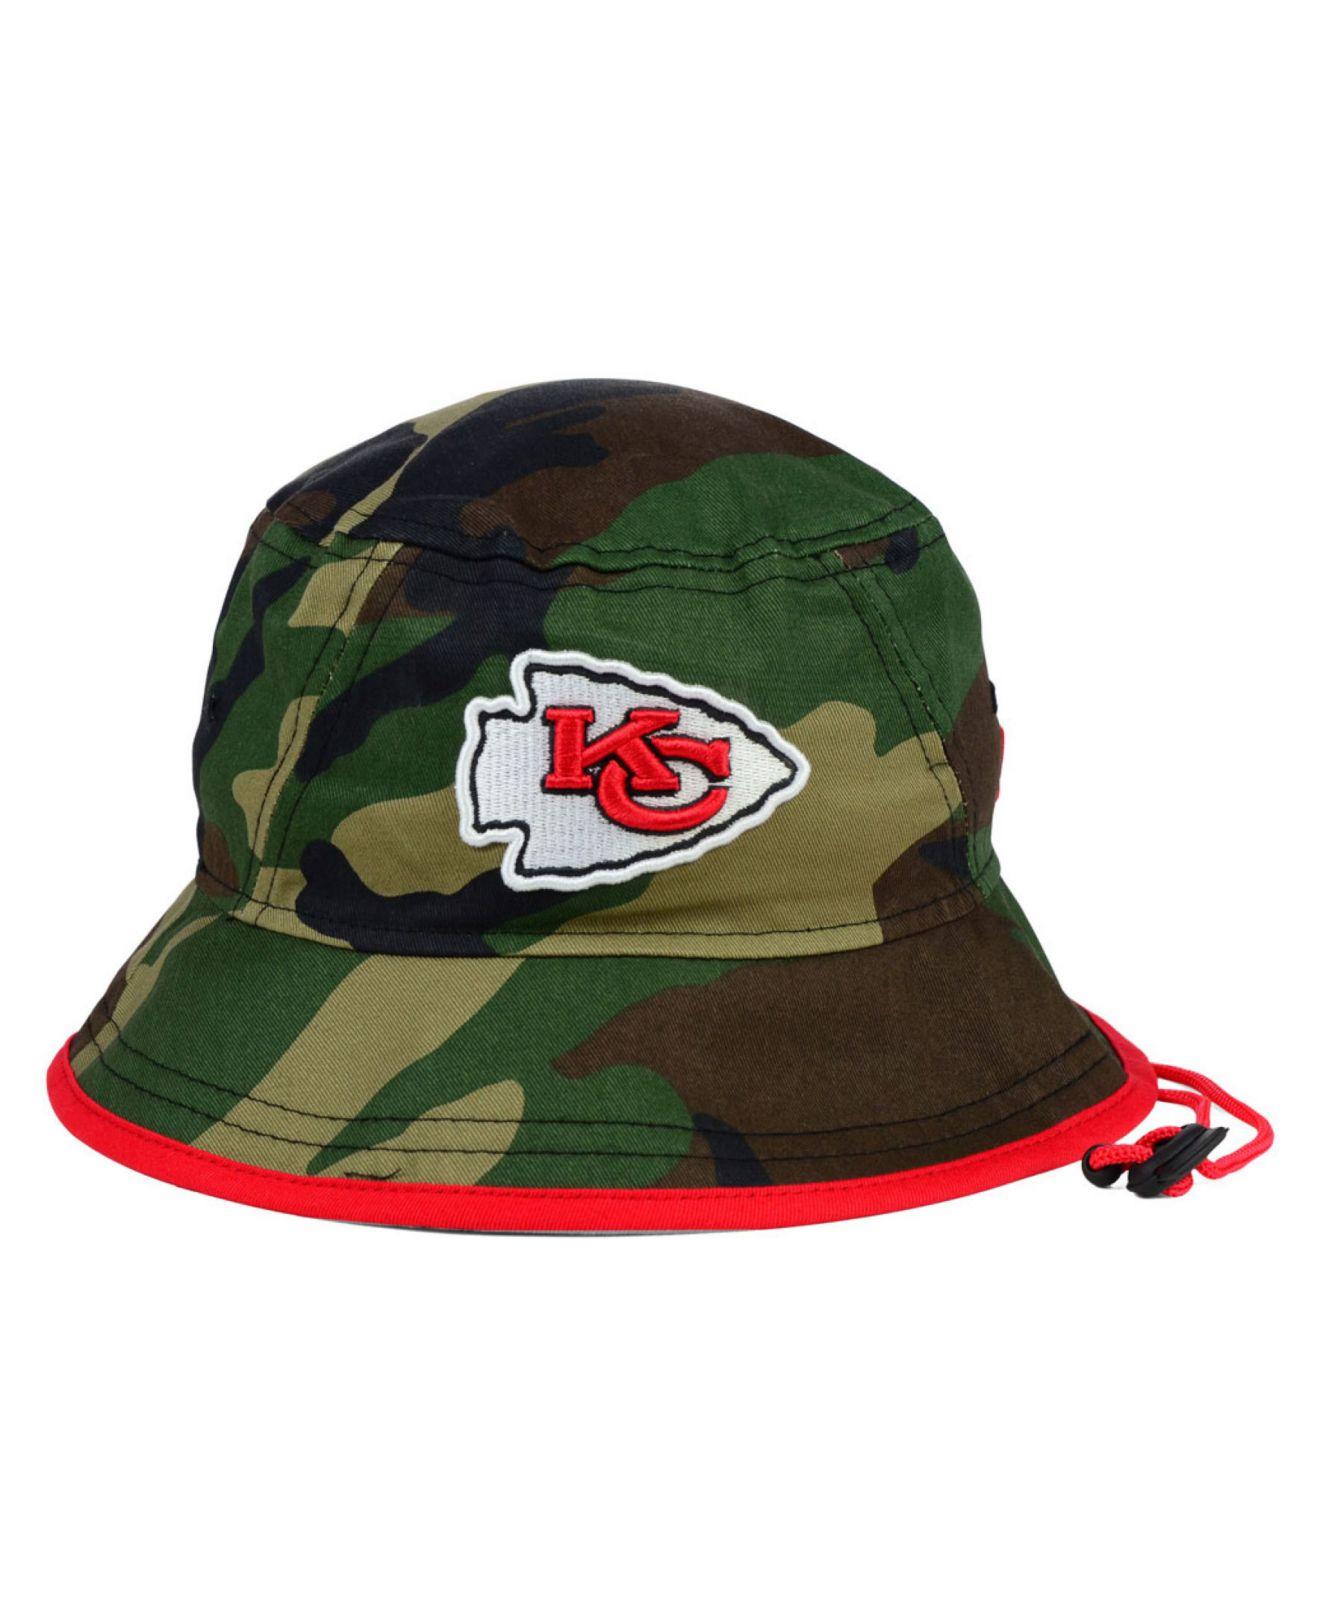 best service f114f 7f771 KTZ Kansas City Chiefs Camo Pop Bucket Hat in Green for Men - Lyst